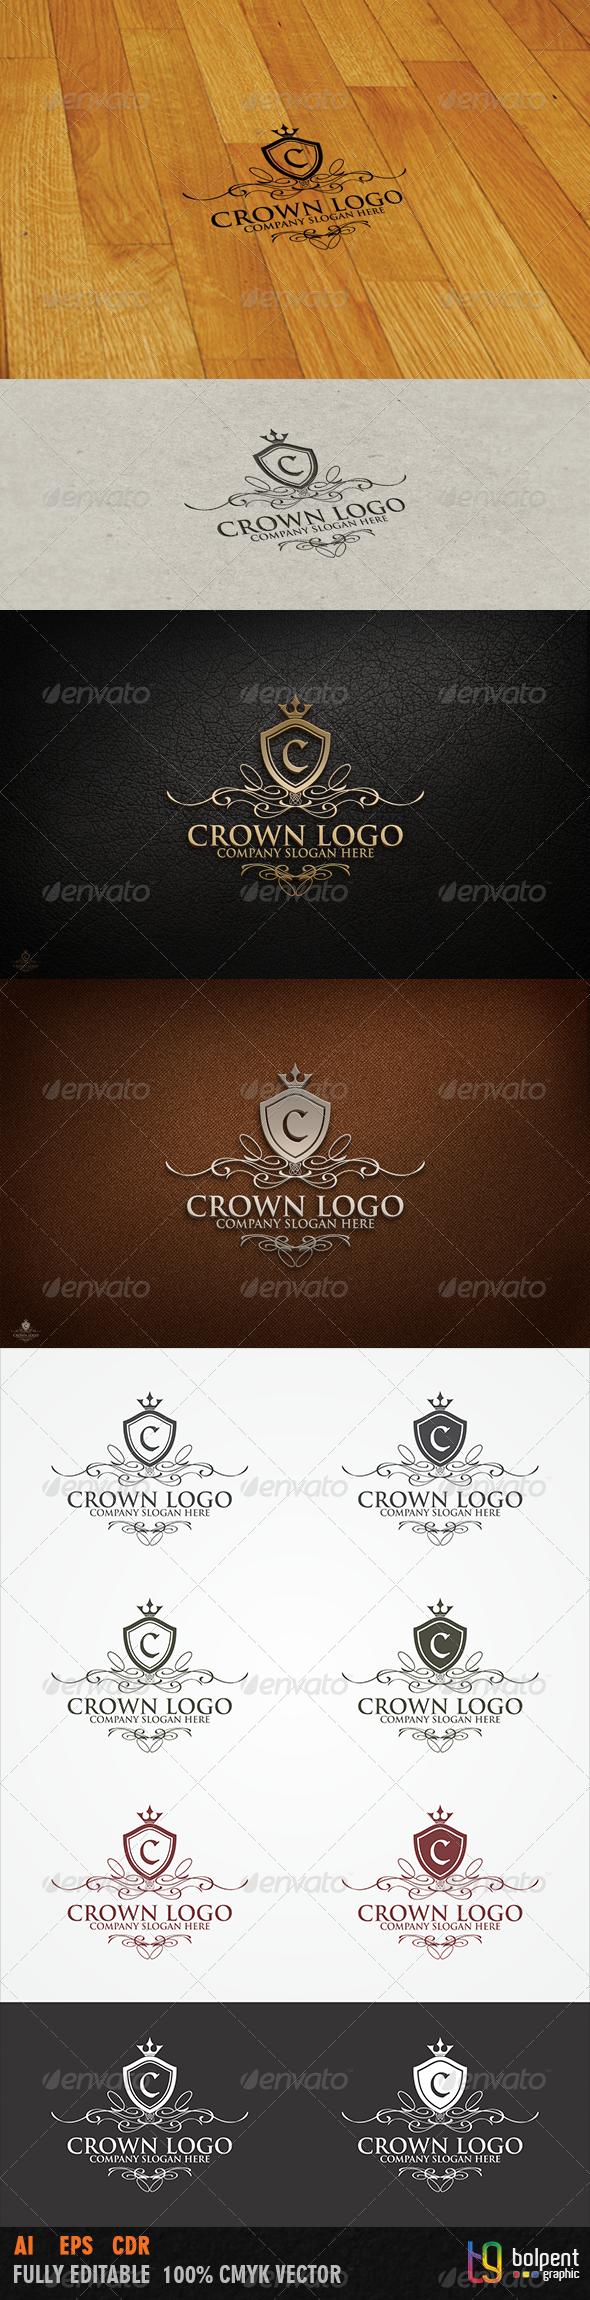 GraphicRiver Crown Logo Template 3738598